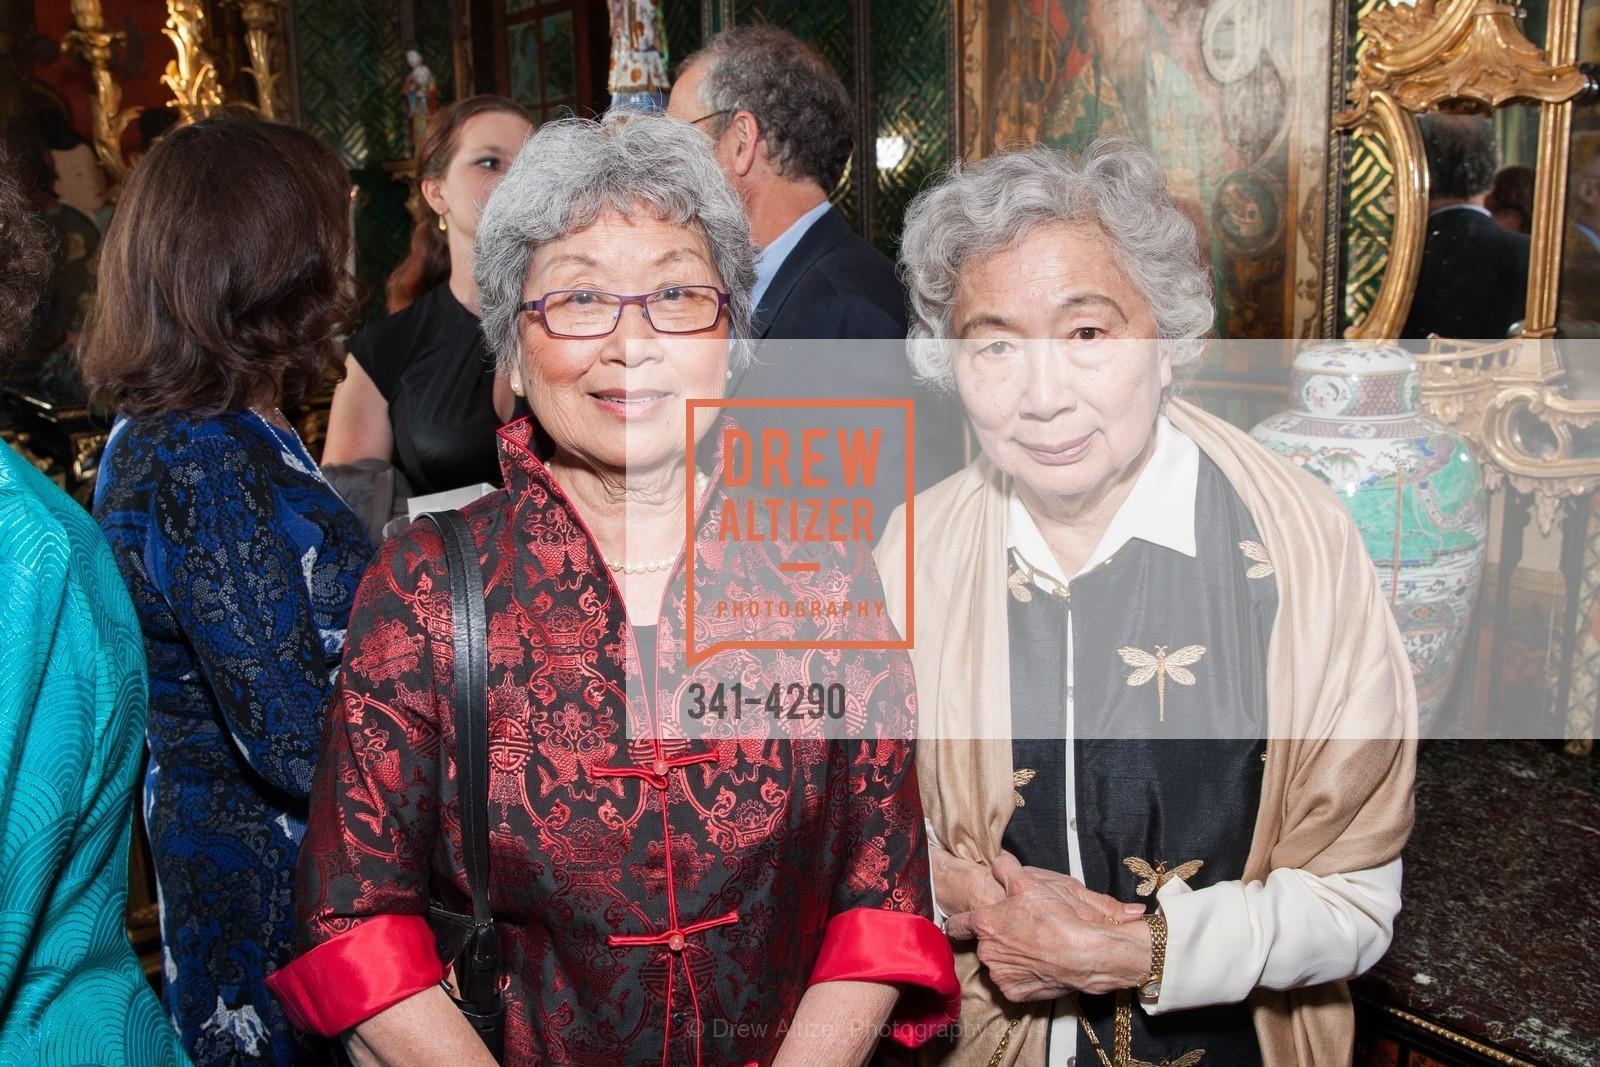 Diana Chua, Bettine Kuh, Photo #341-4290